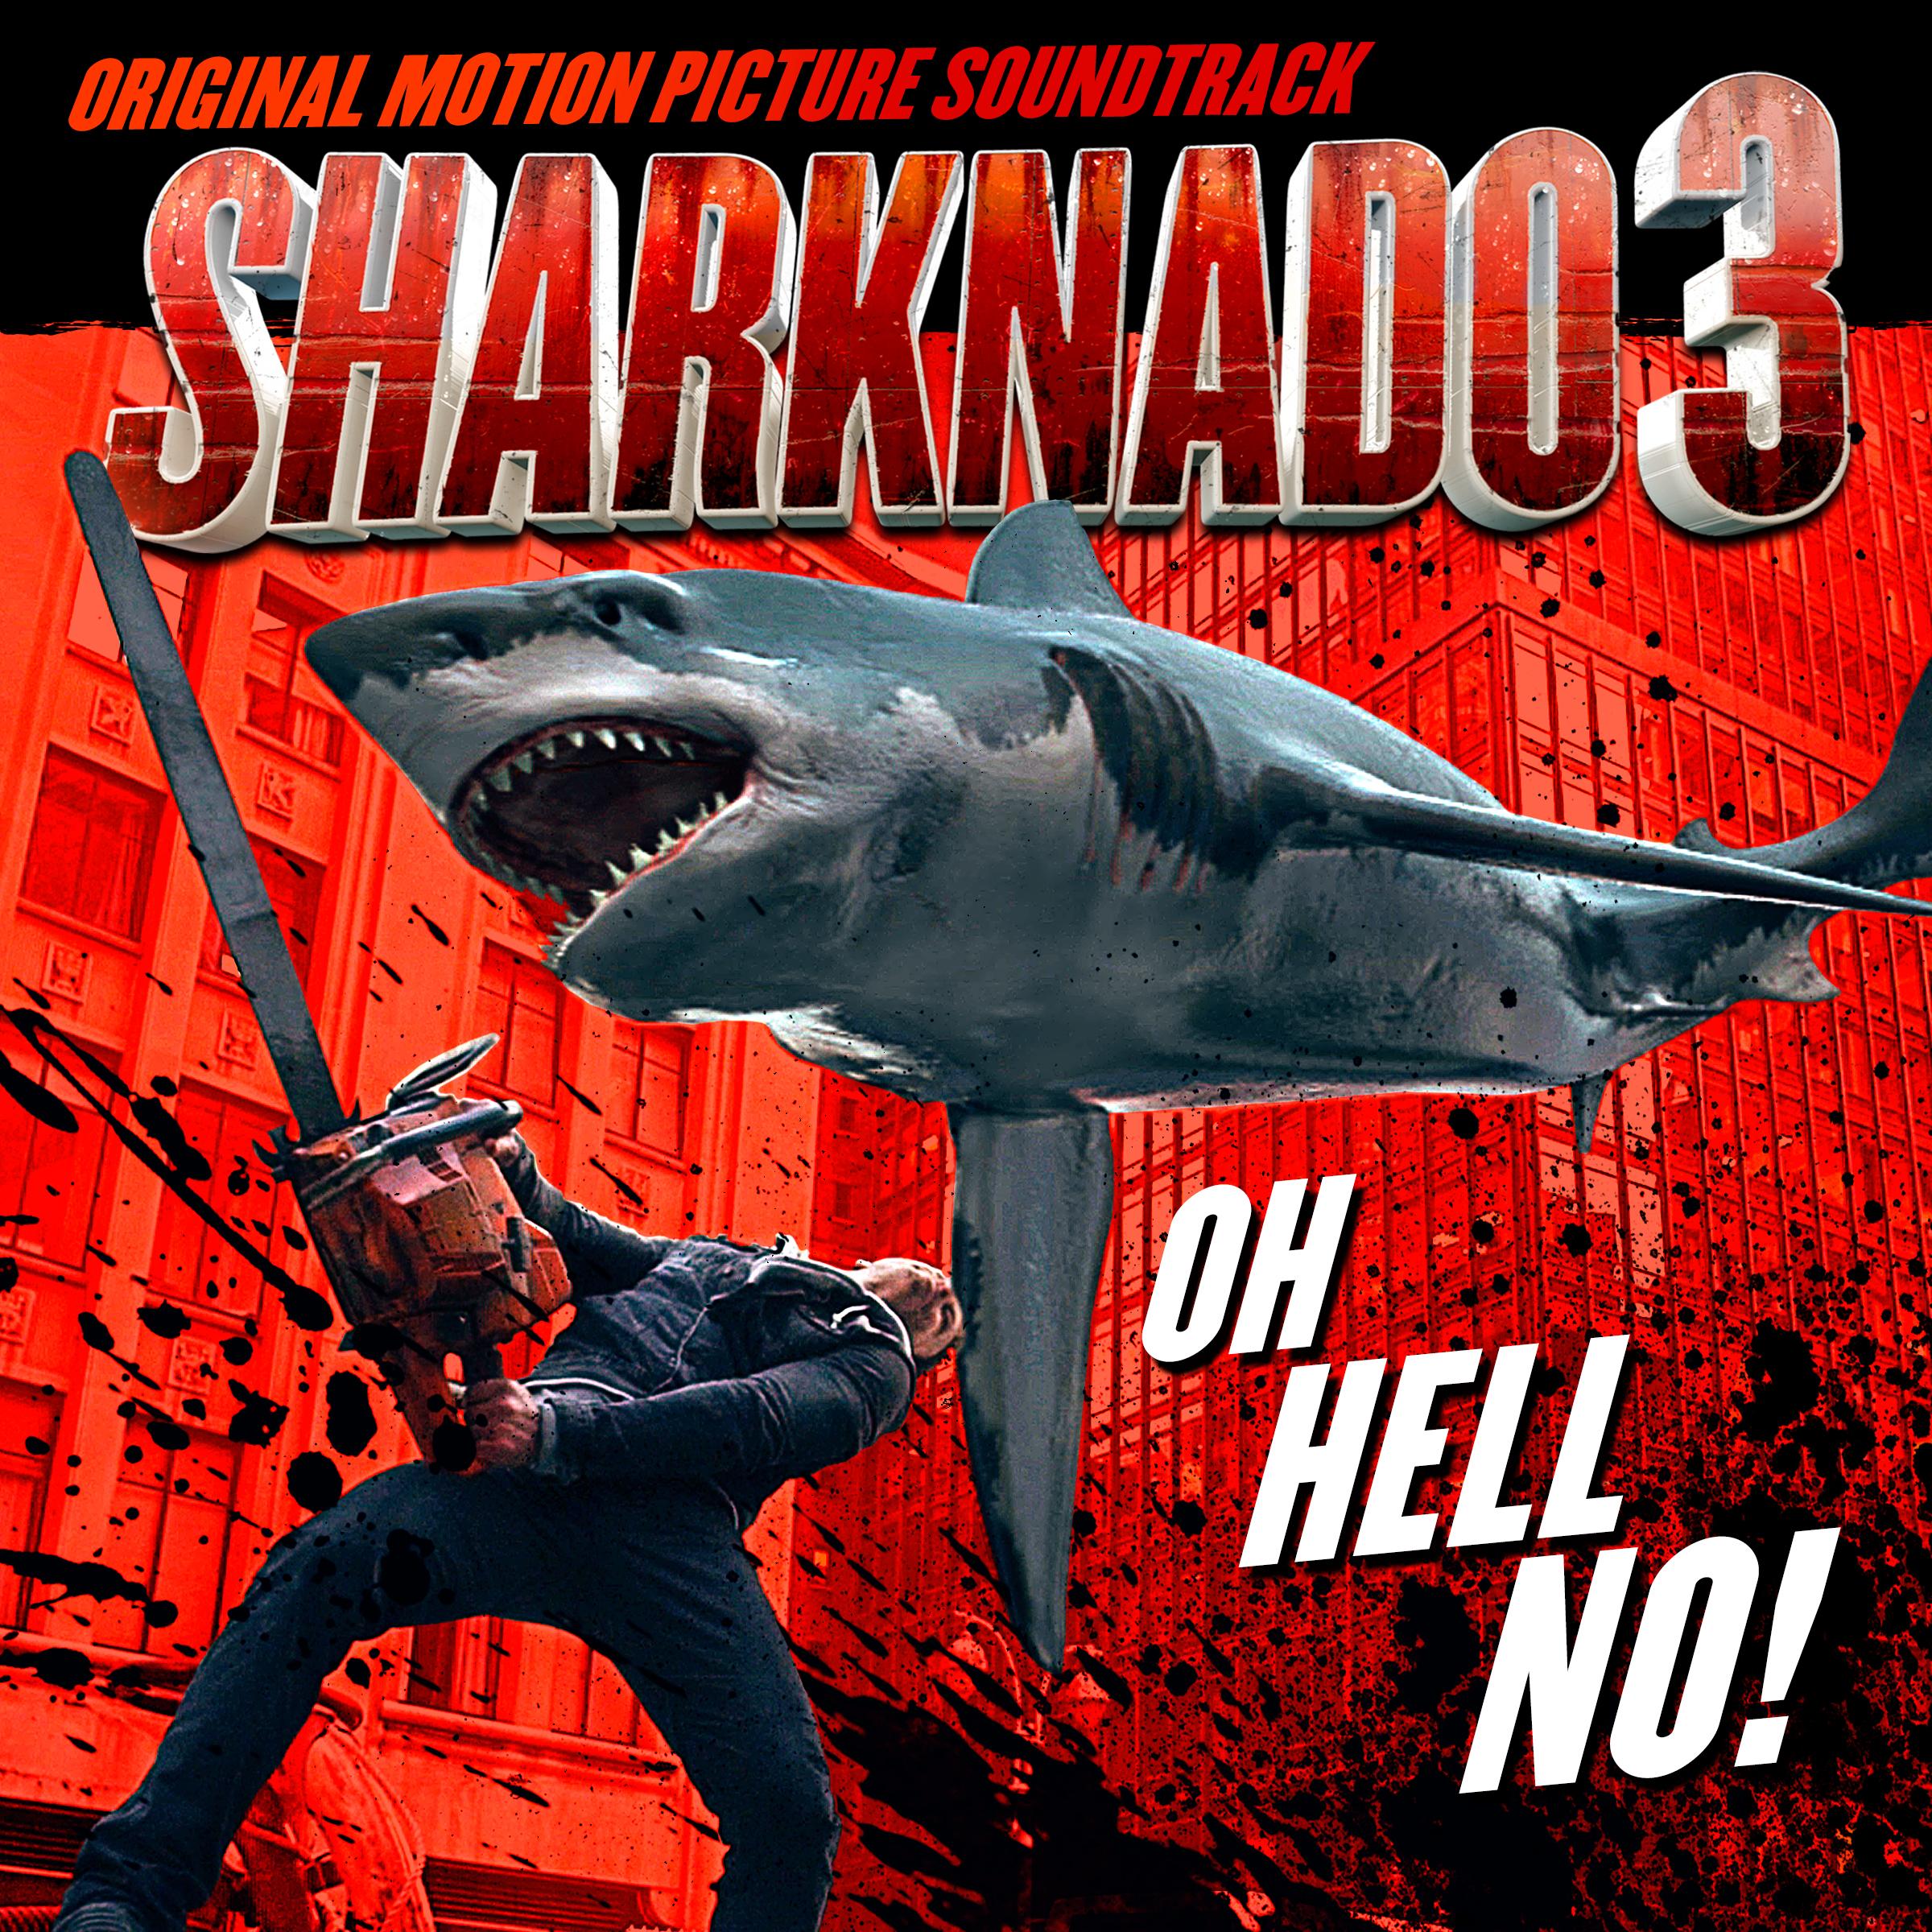 sharknado-3-oh-hell-no-soundtrack_2400.jpg